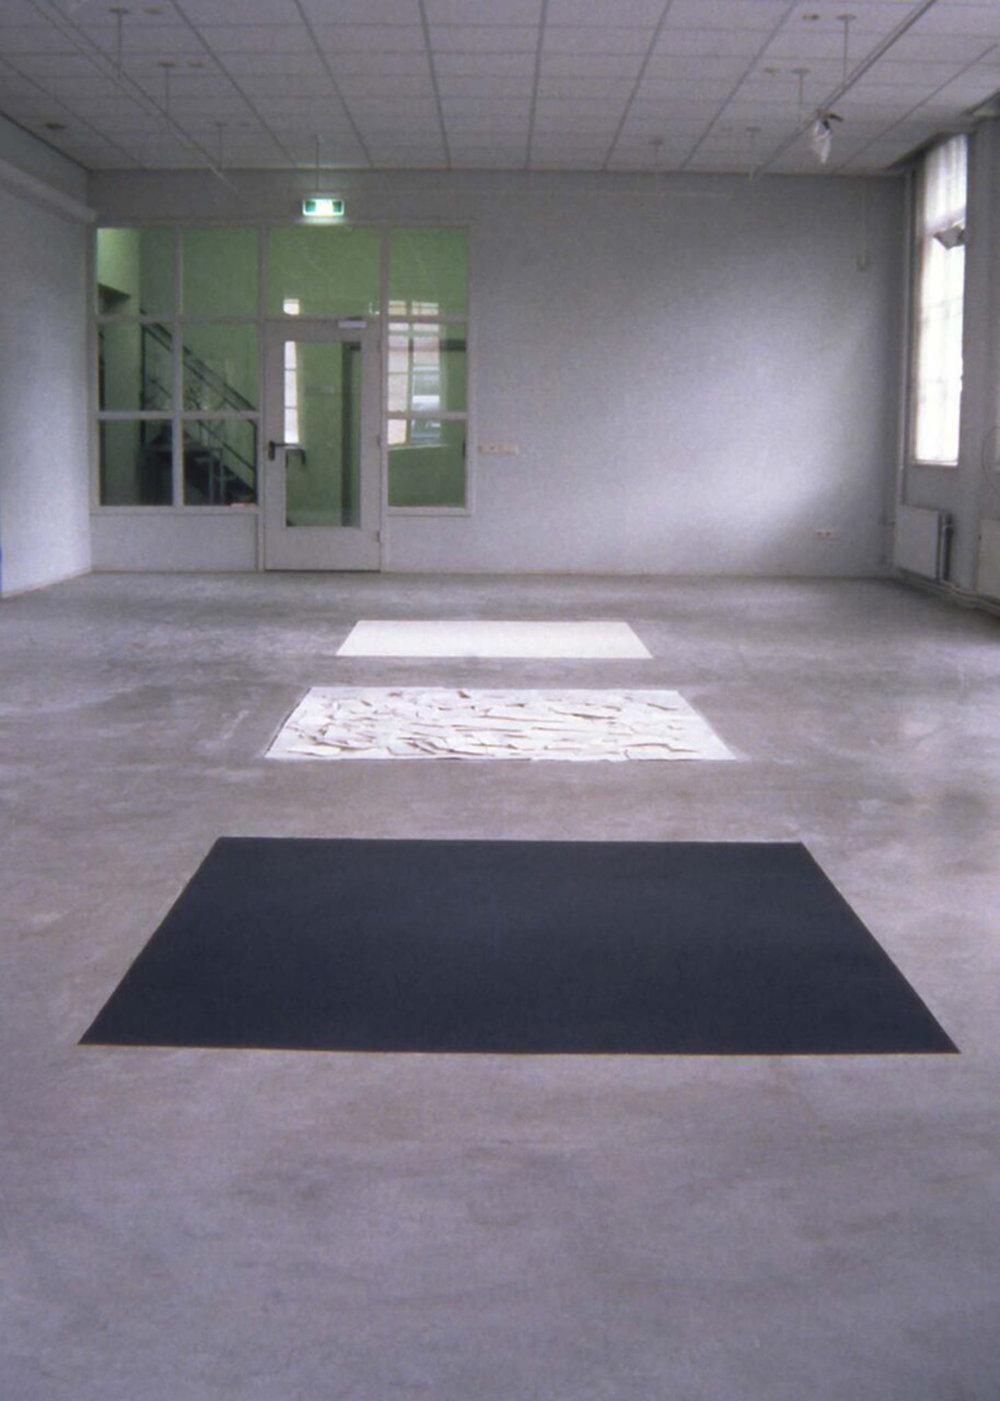 Shard Squares, 1997  Europees Keramisch Workcentrum, s'Hertogenbosch, NL  Porcelain, Graphite,Each square: 5' x 5' x 5'